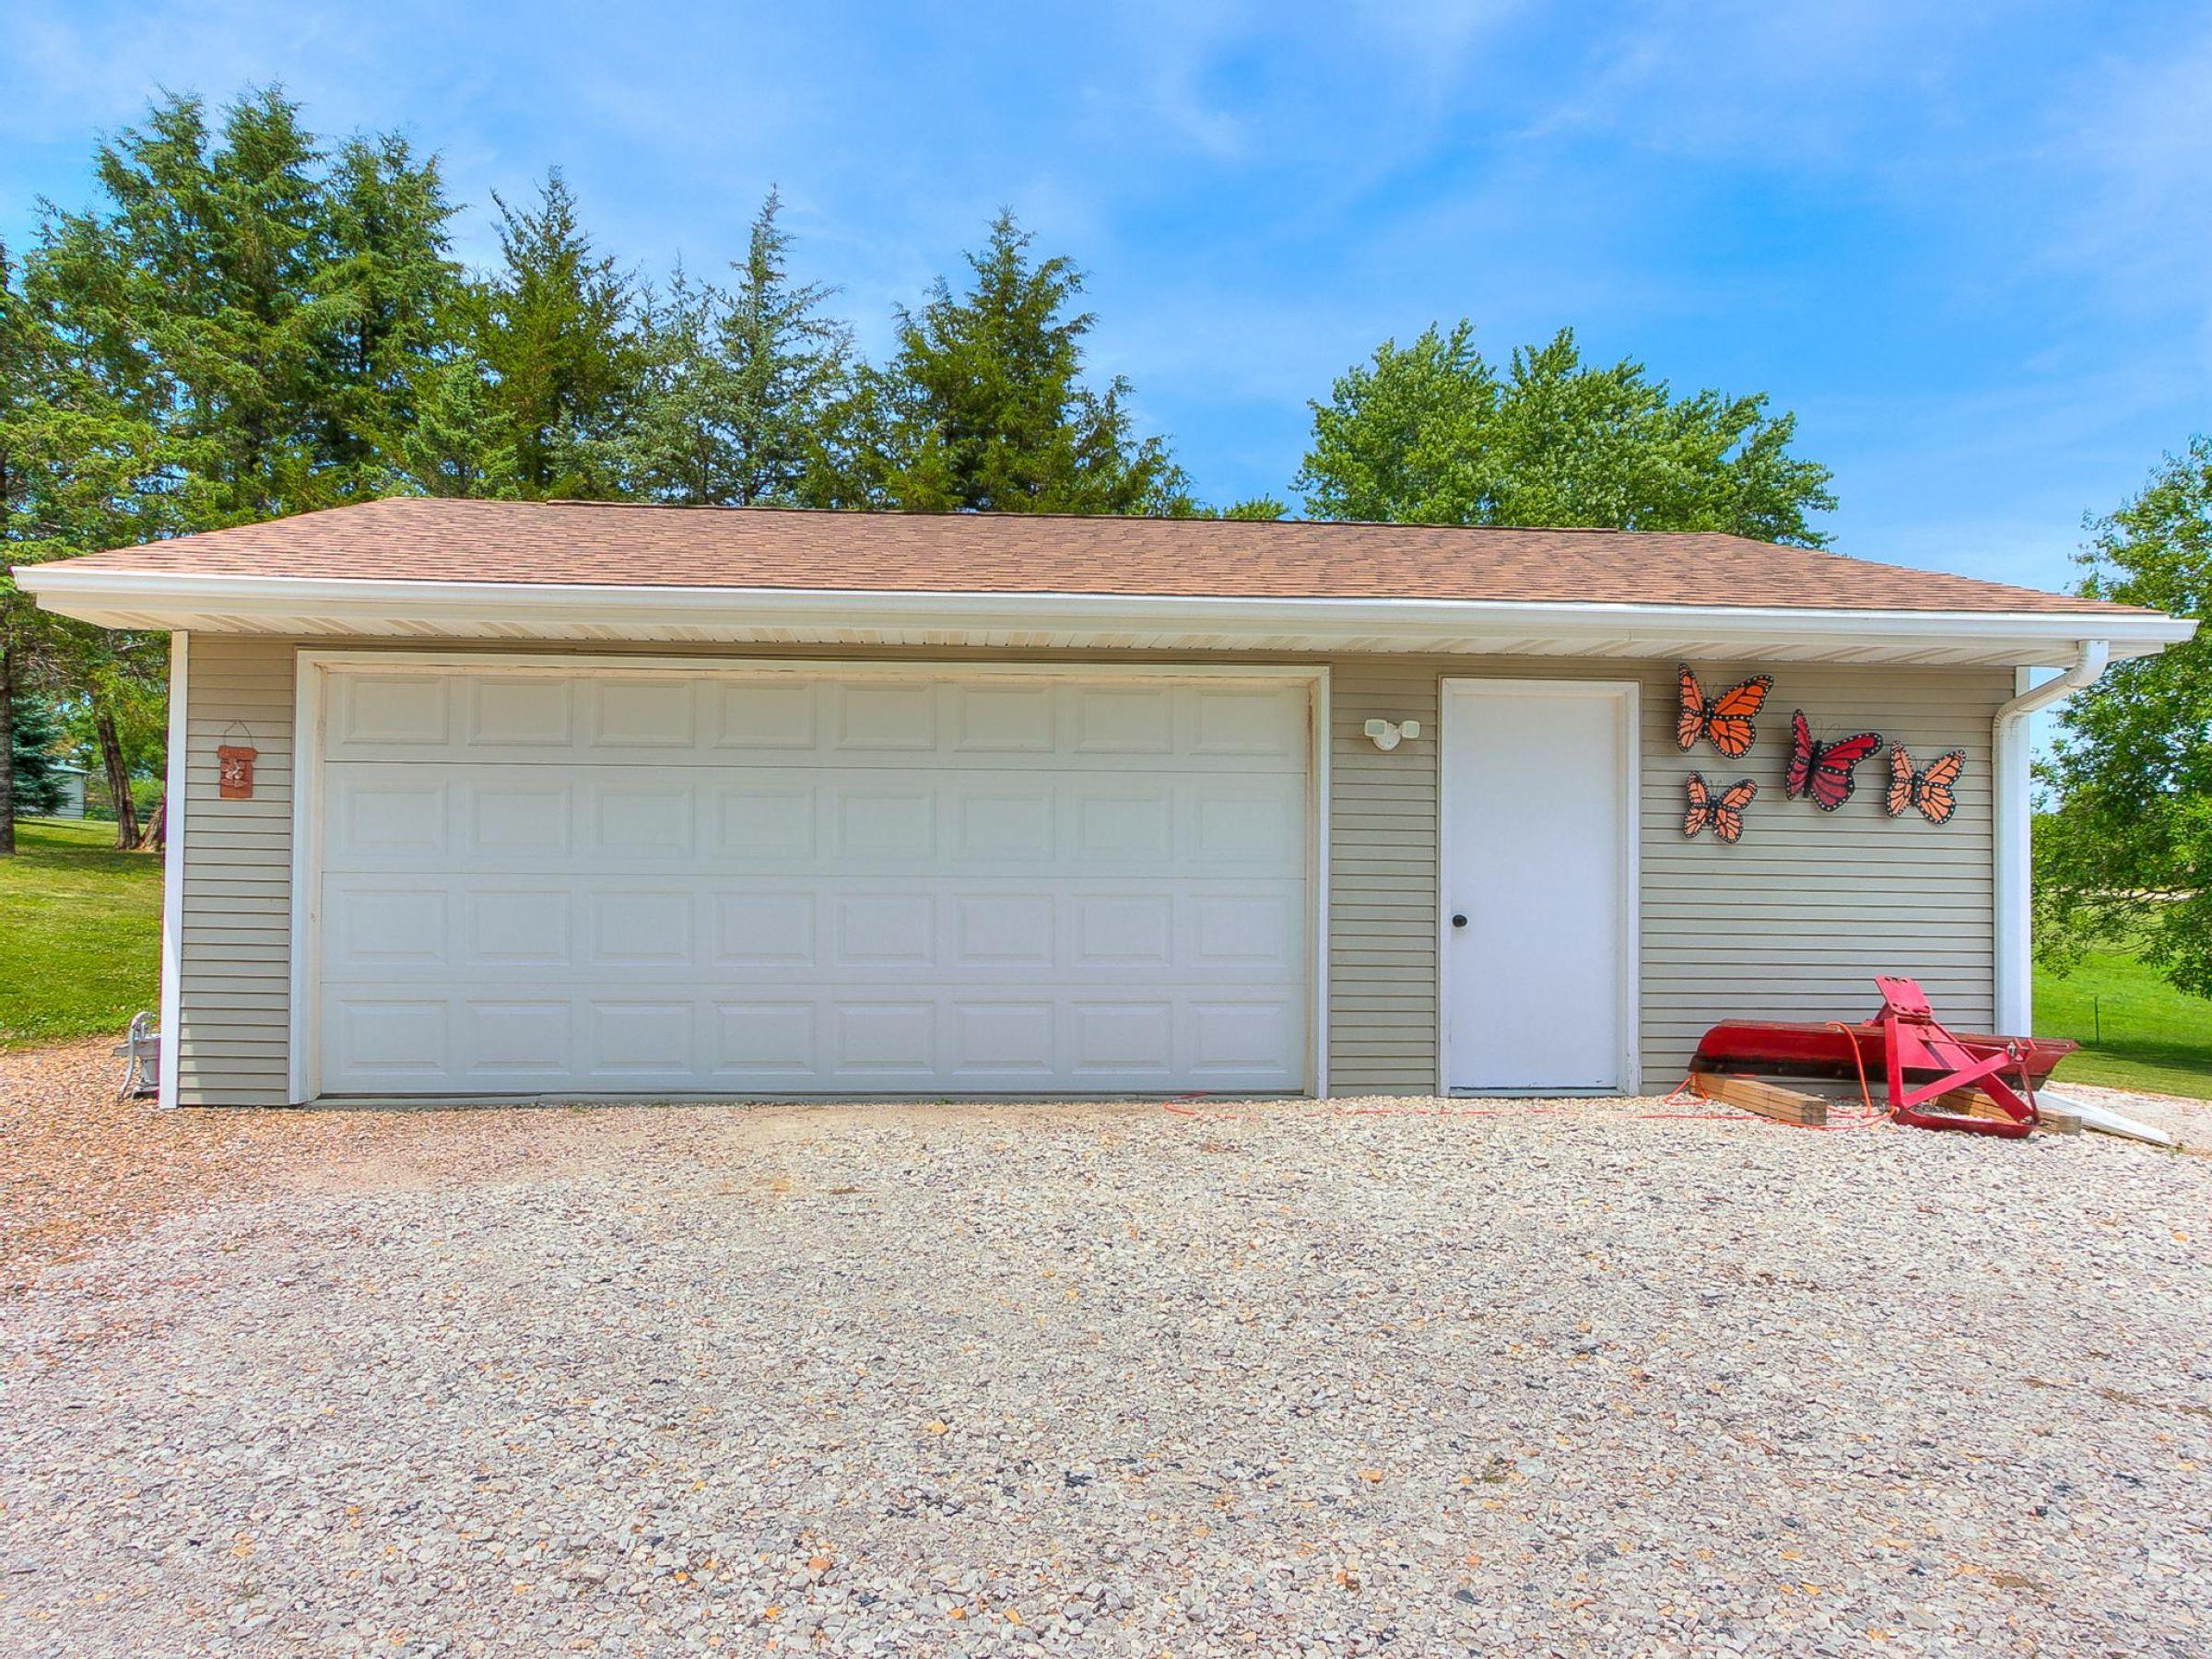 residential-warren-county-iowa-3-acres-listing-number-15593-2-2021-06-18-154728.jpg